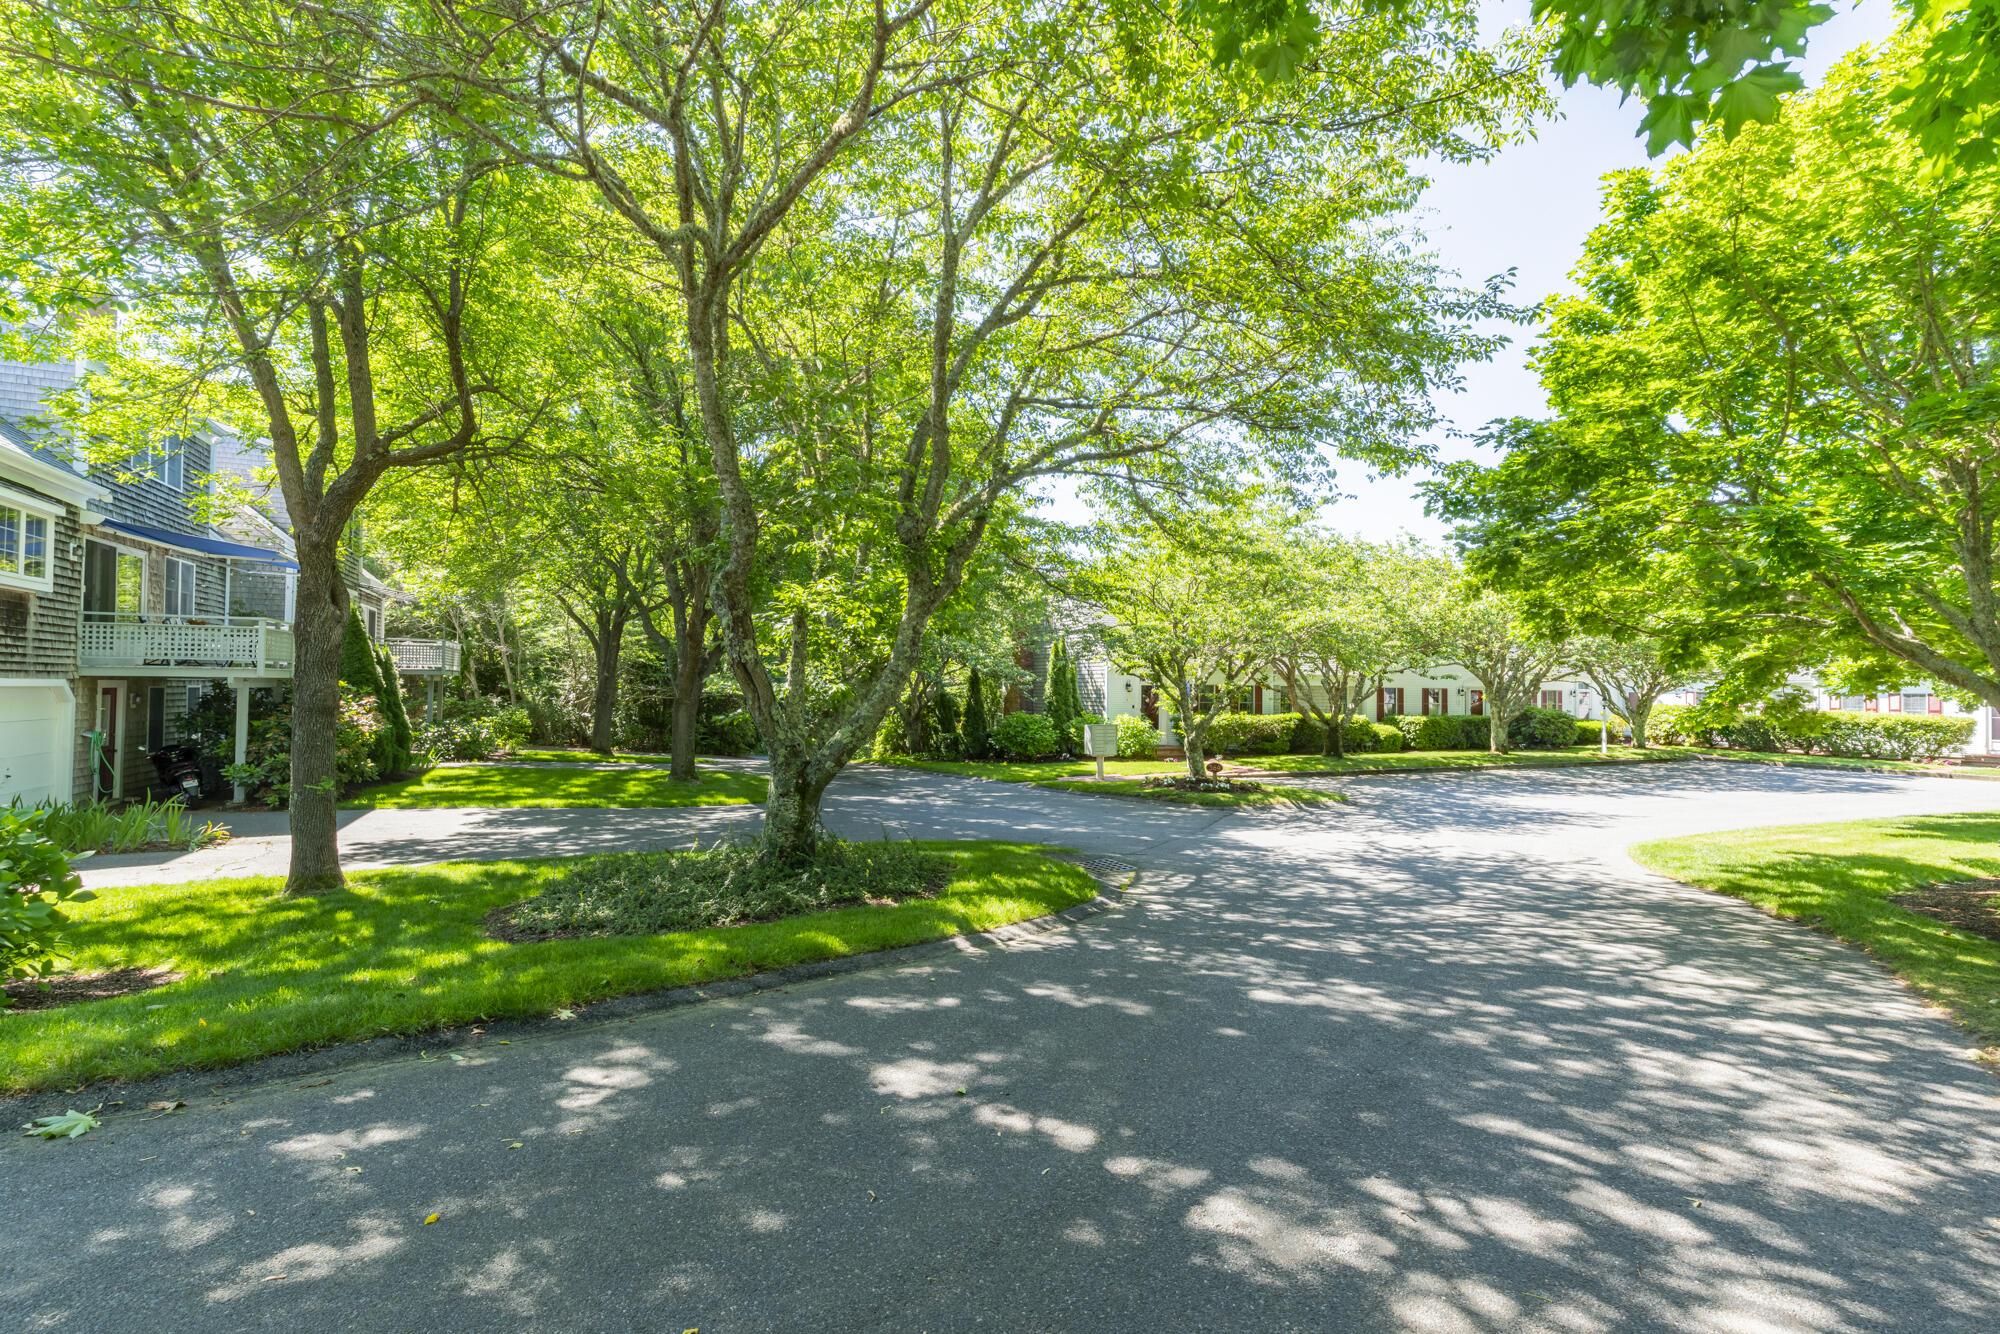 367-D Orleans Road, Chatham MA, 02633 - slide 34